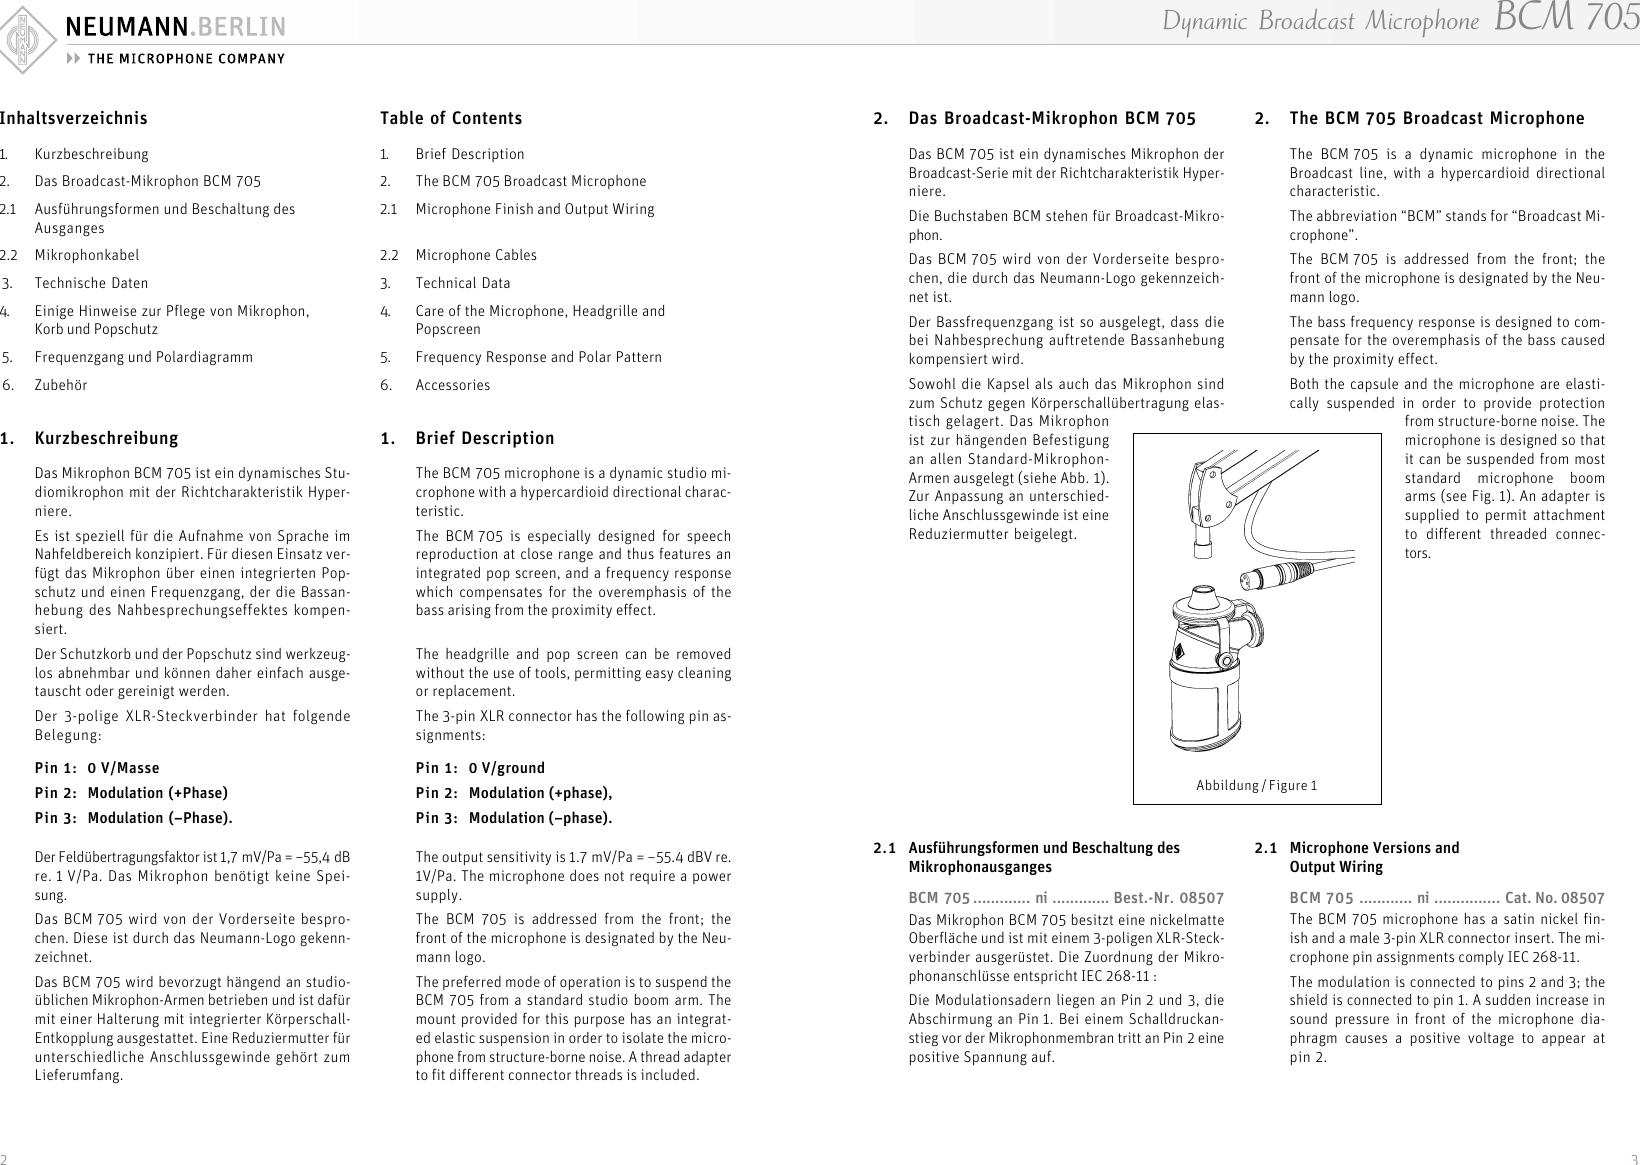 Neumann Berlin Bcm 705 Users Manual